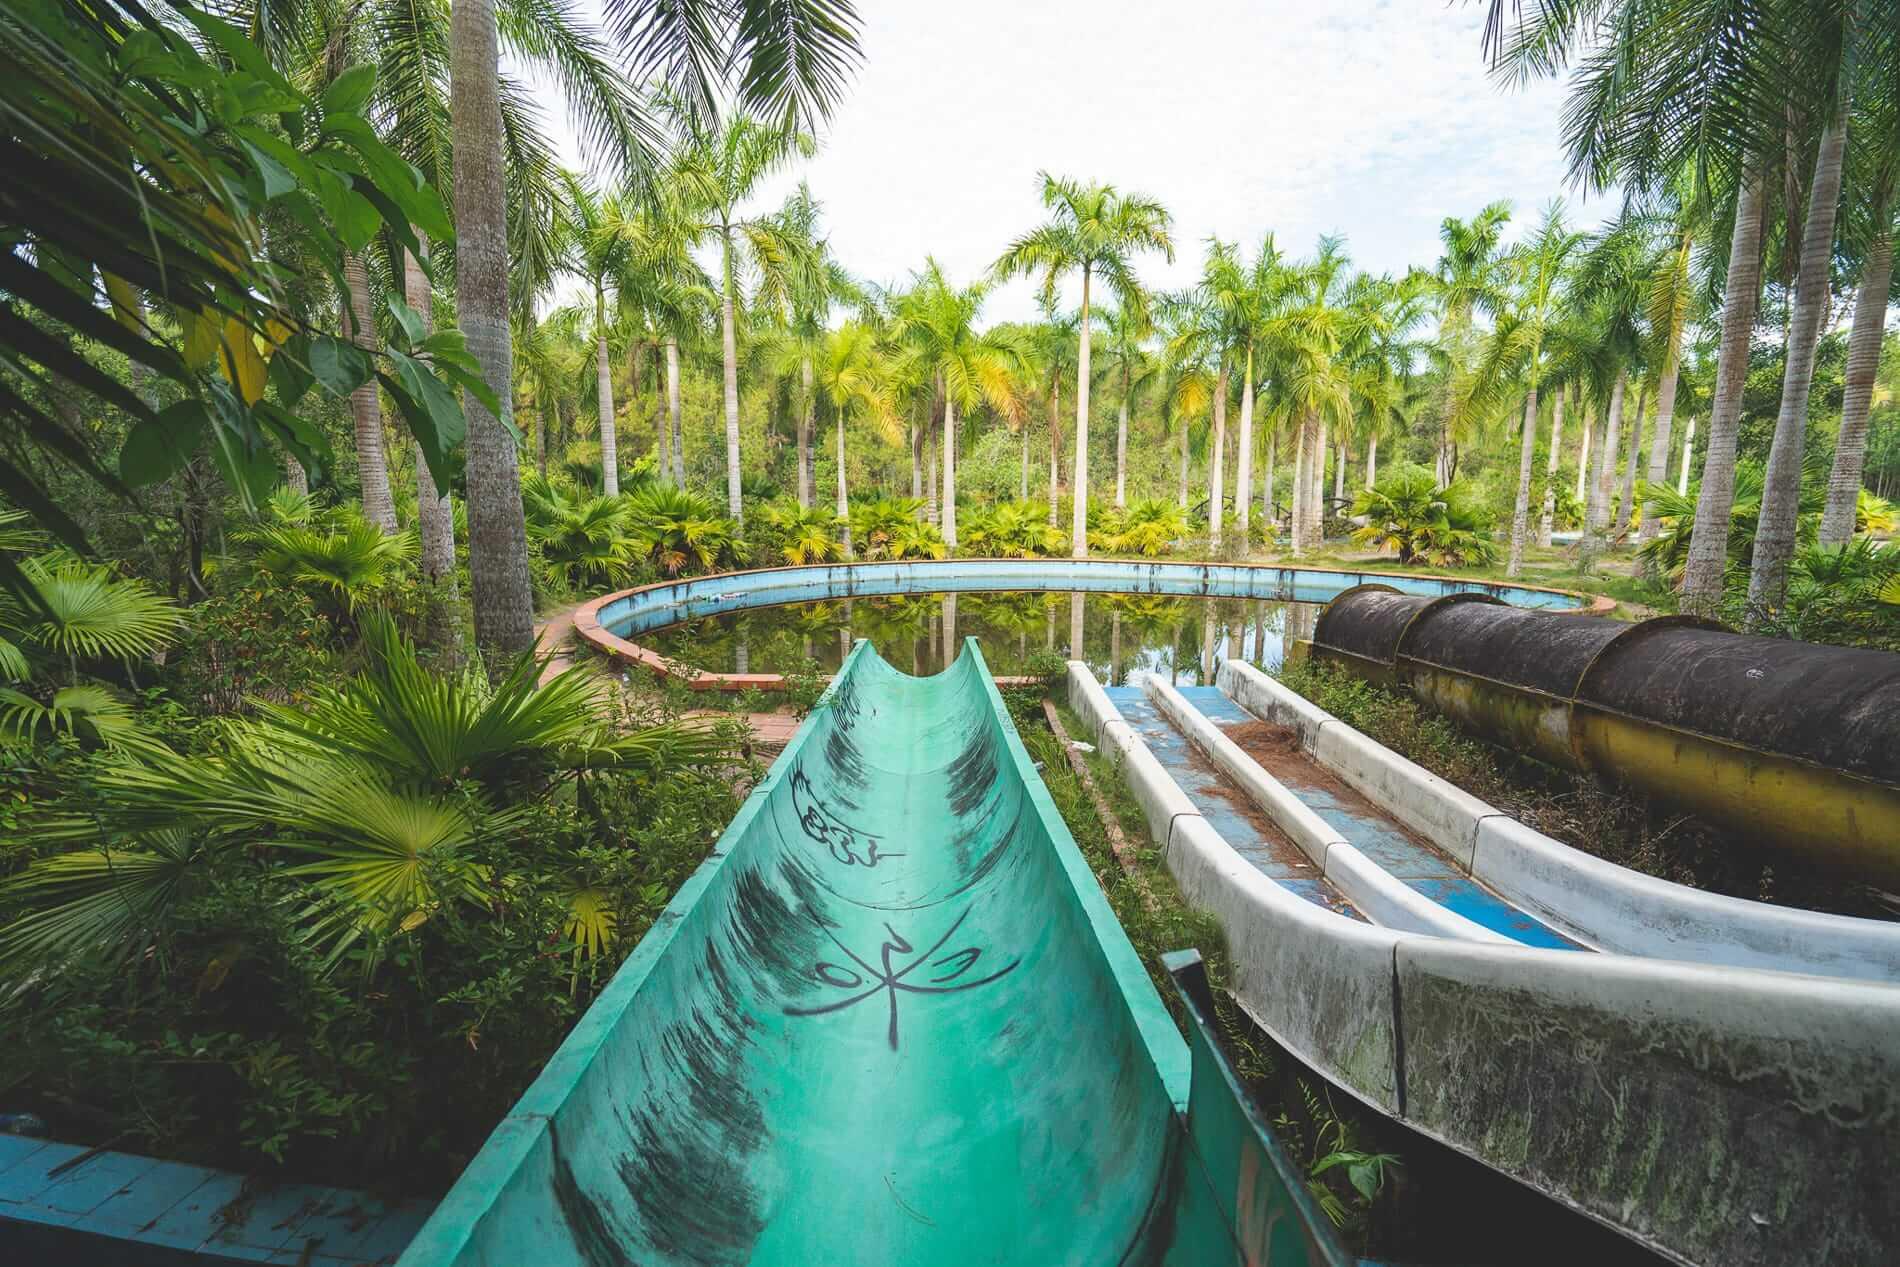 Dirty old slides - Hues Abandoned Water Park